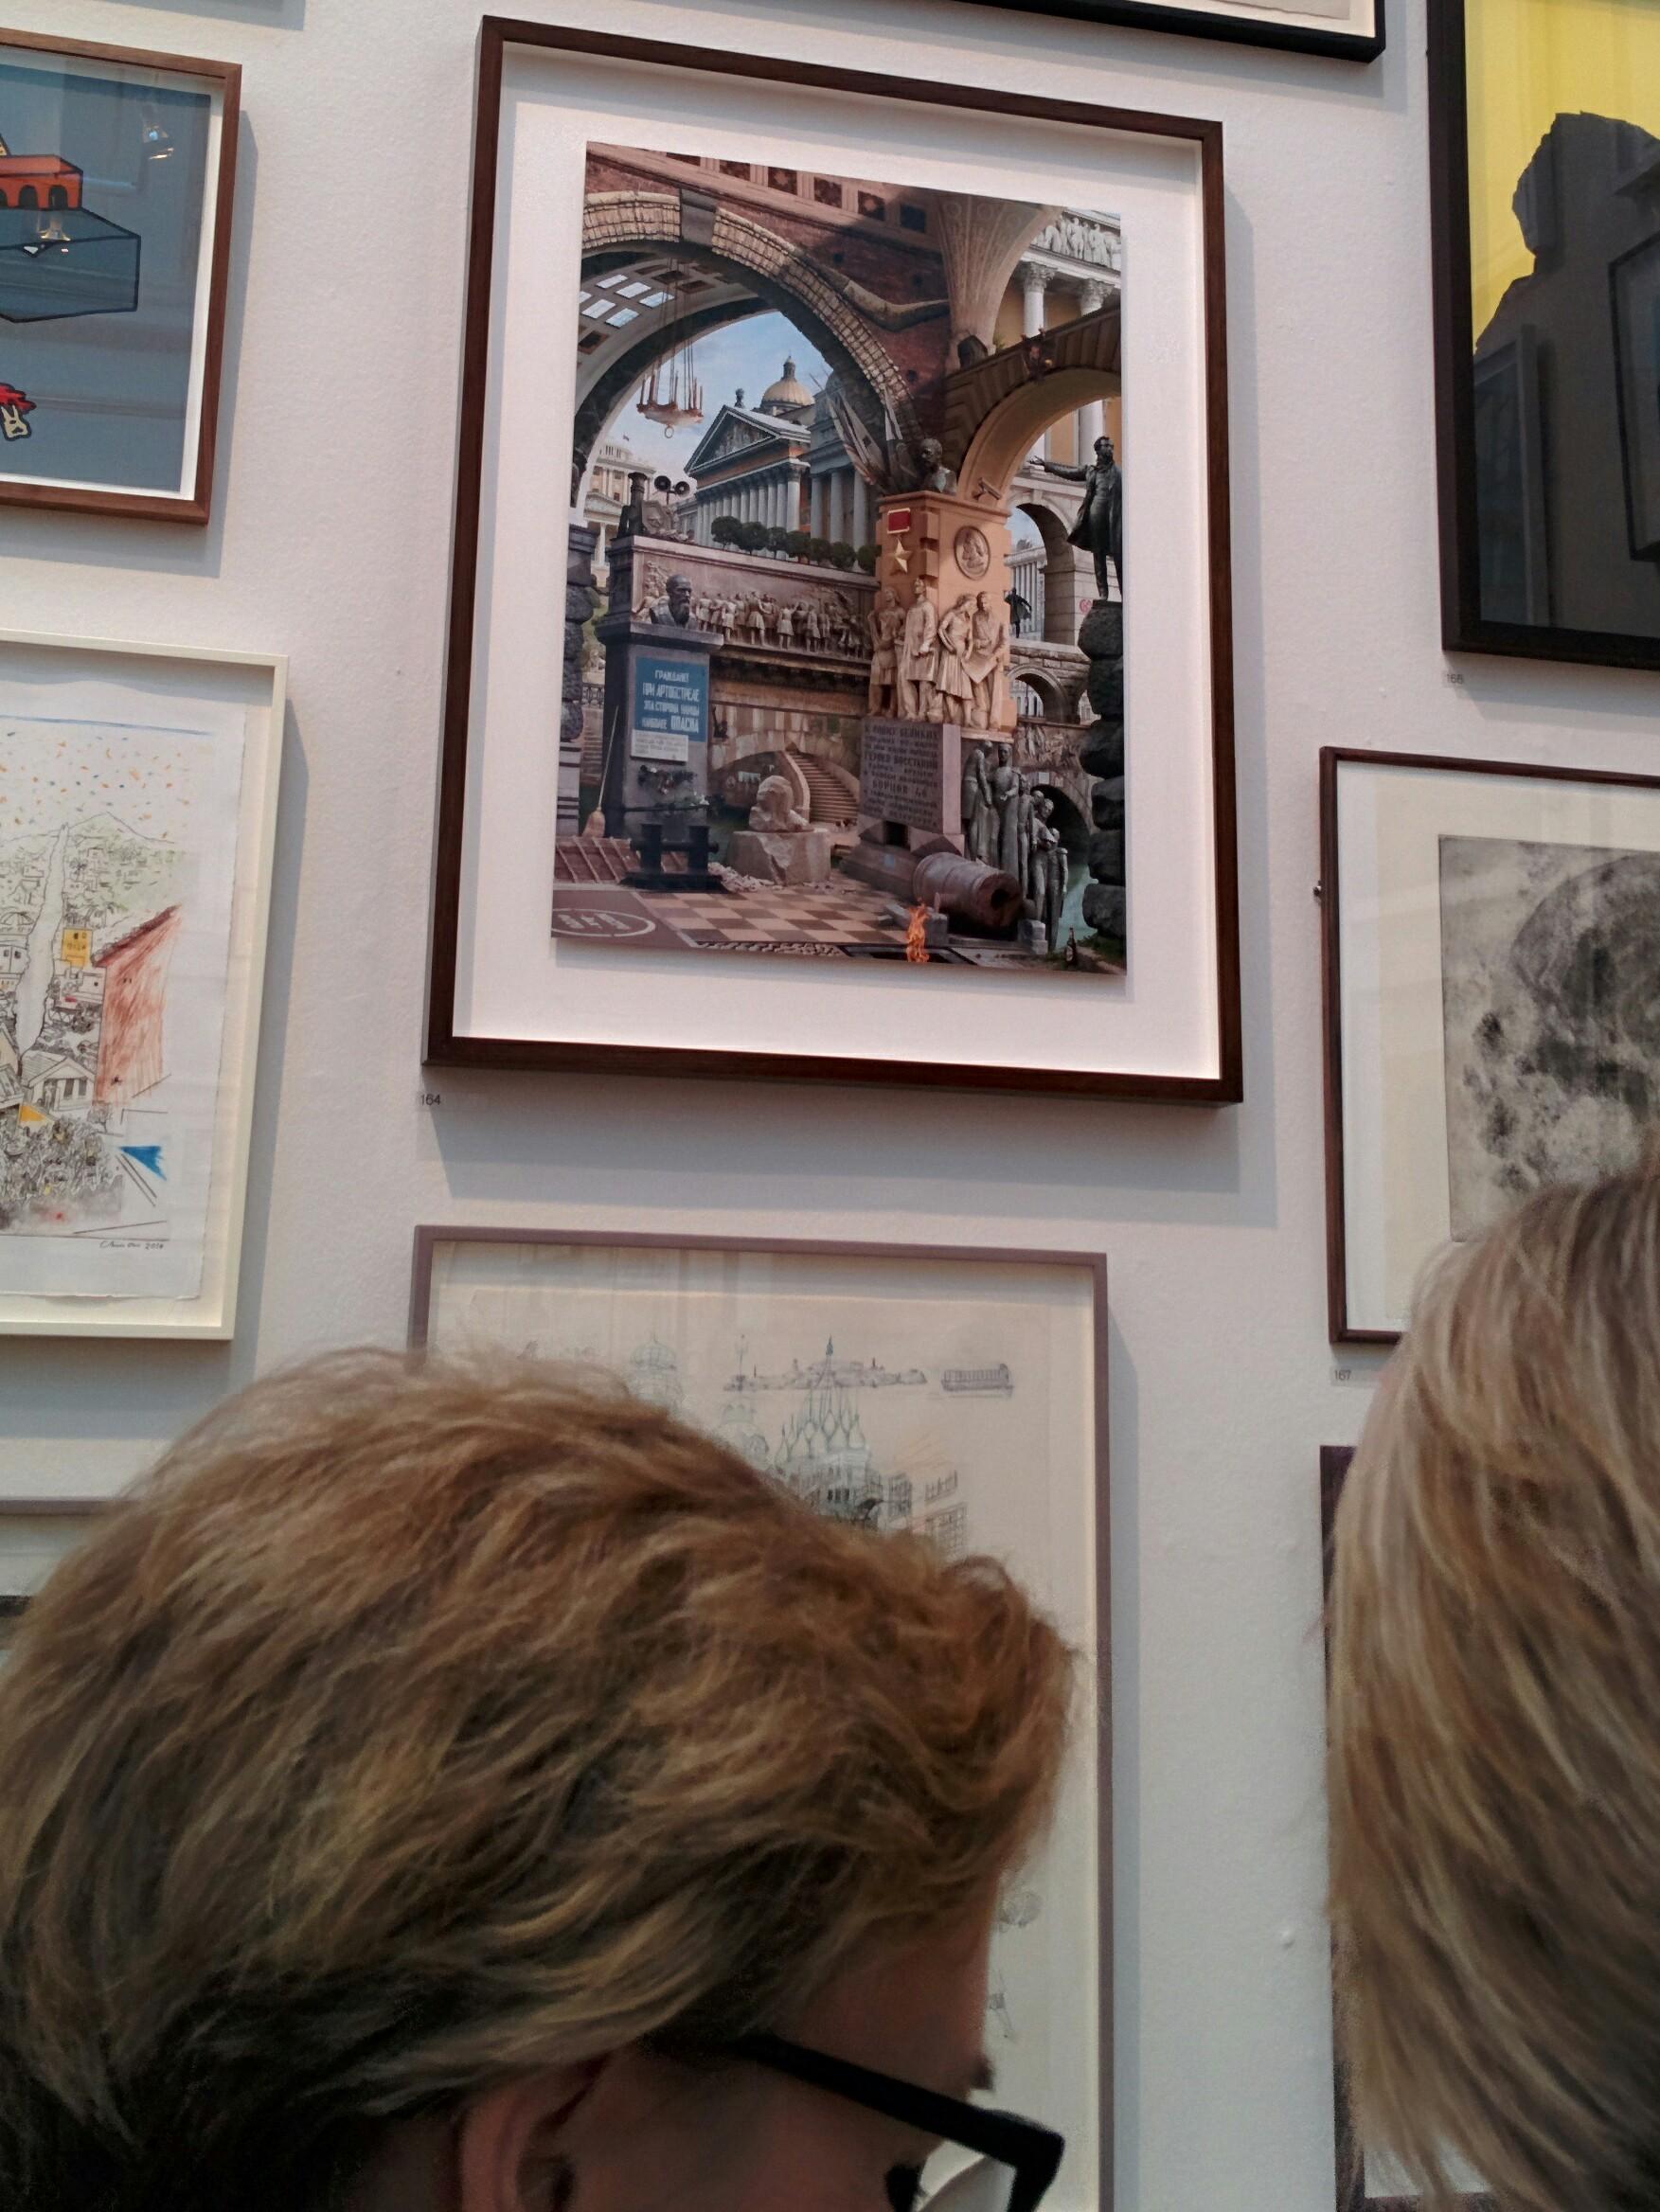 Emily Allchurch's work 'Urban Chiaroscuro 8: St. Petersburg (after Piranesi)' at the Royal Academy Summer Exhibition 2014